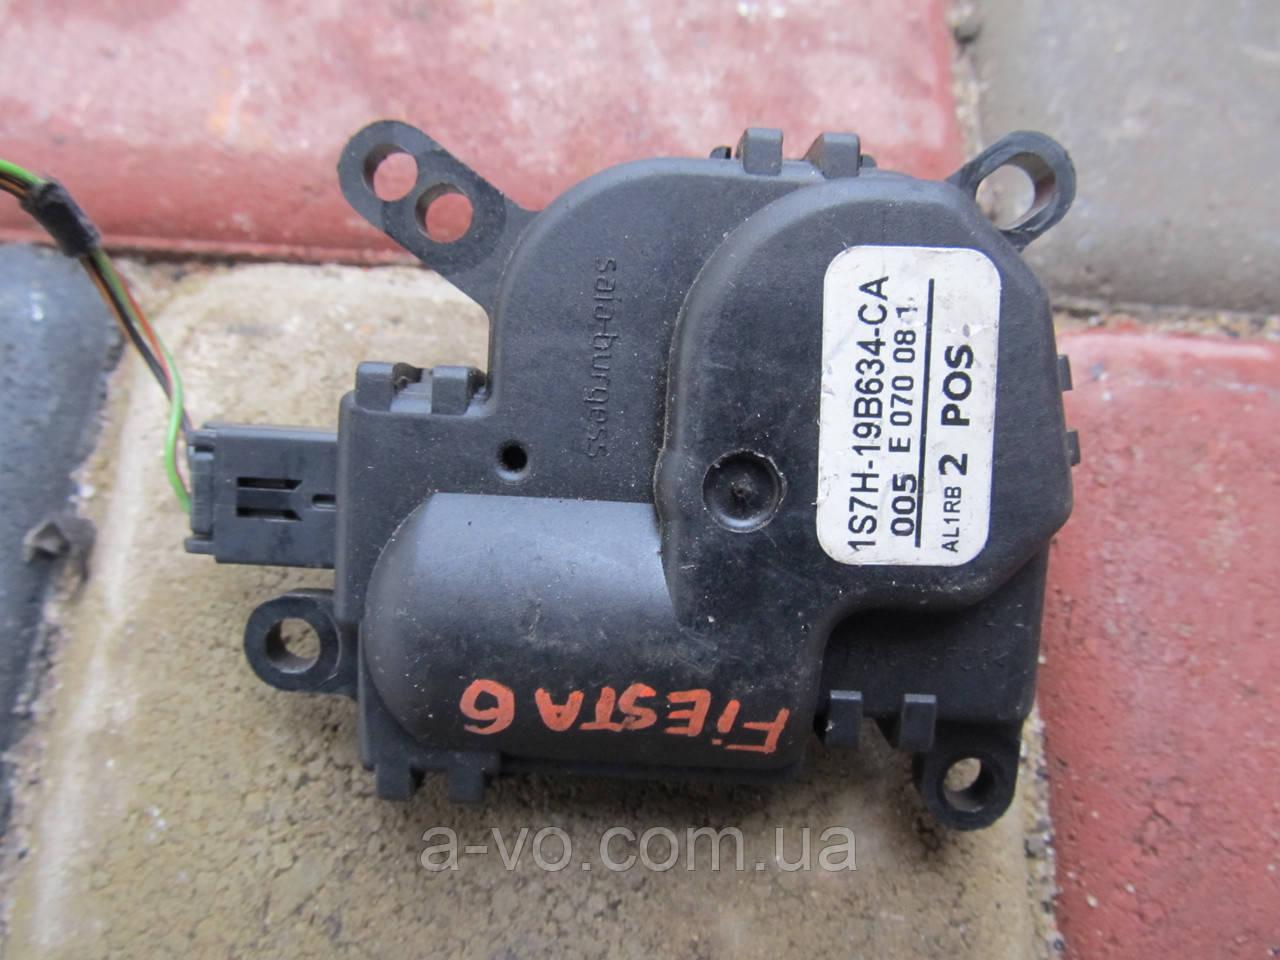 Привод заслонки печки для Ford Focus 2 Fiesta 6 Mondeo 3, 1S7H-19B634-CA, 1S7H19B634CA